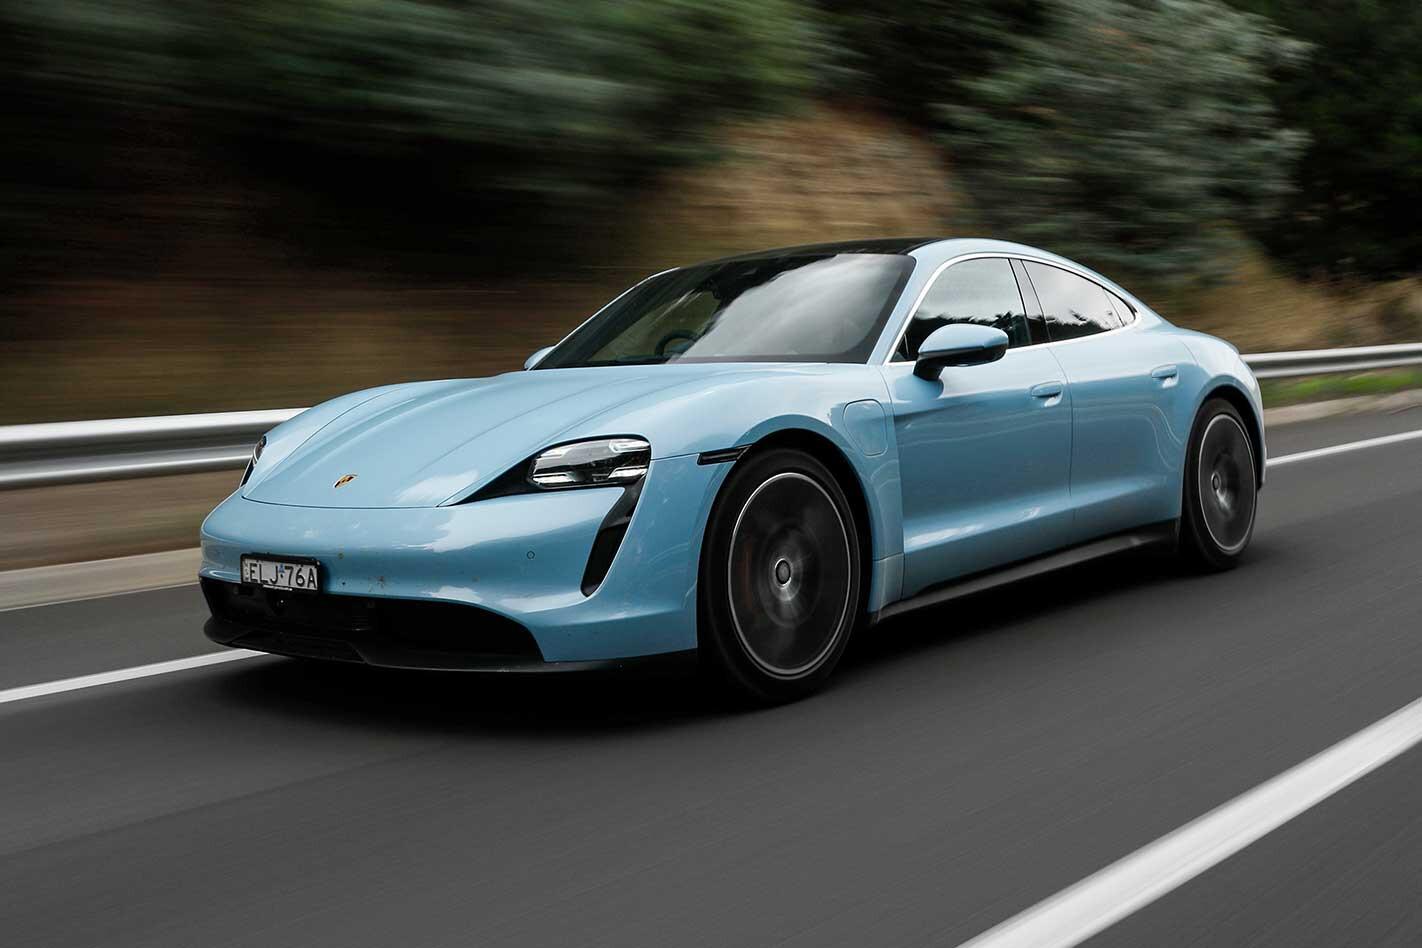 Porsche Taycan 4S review